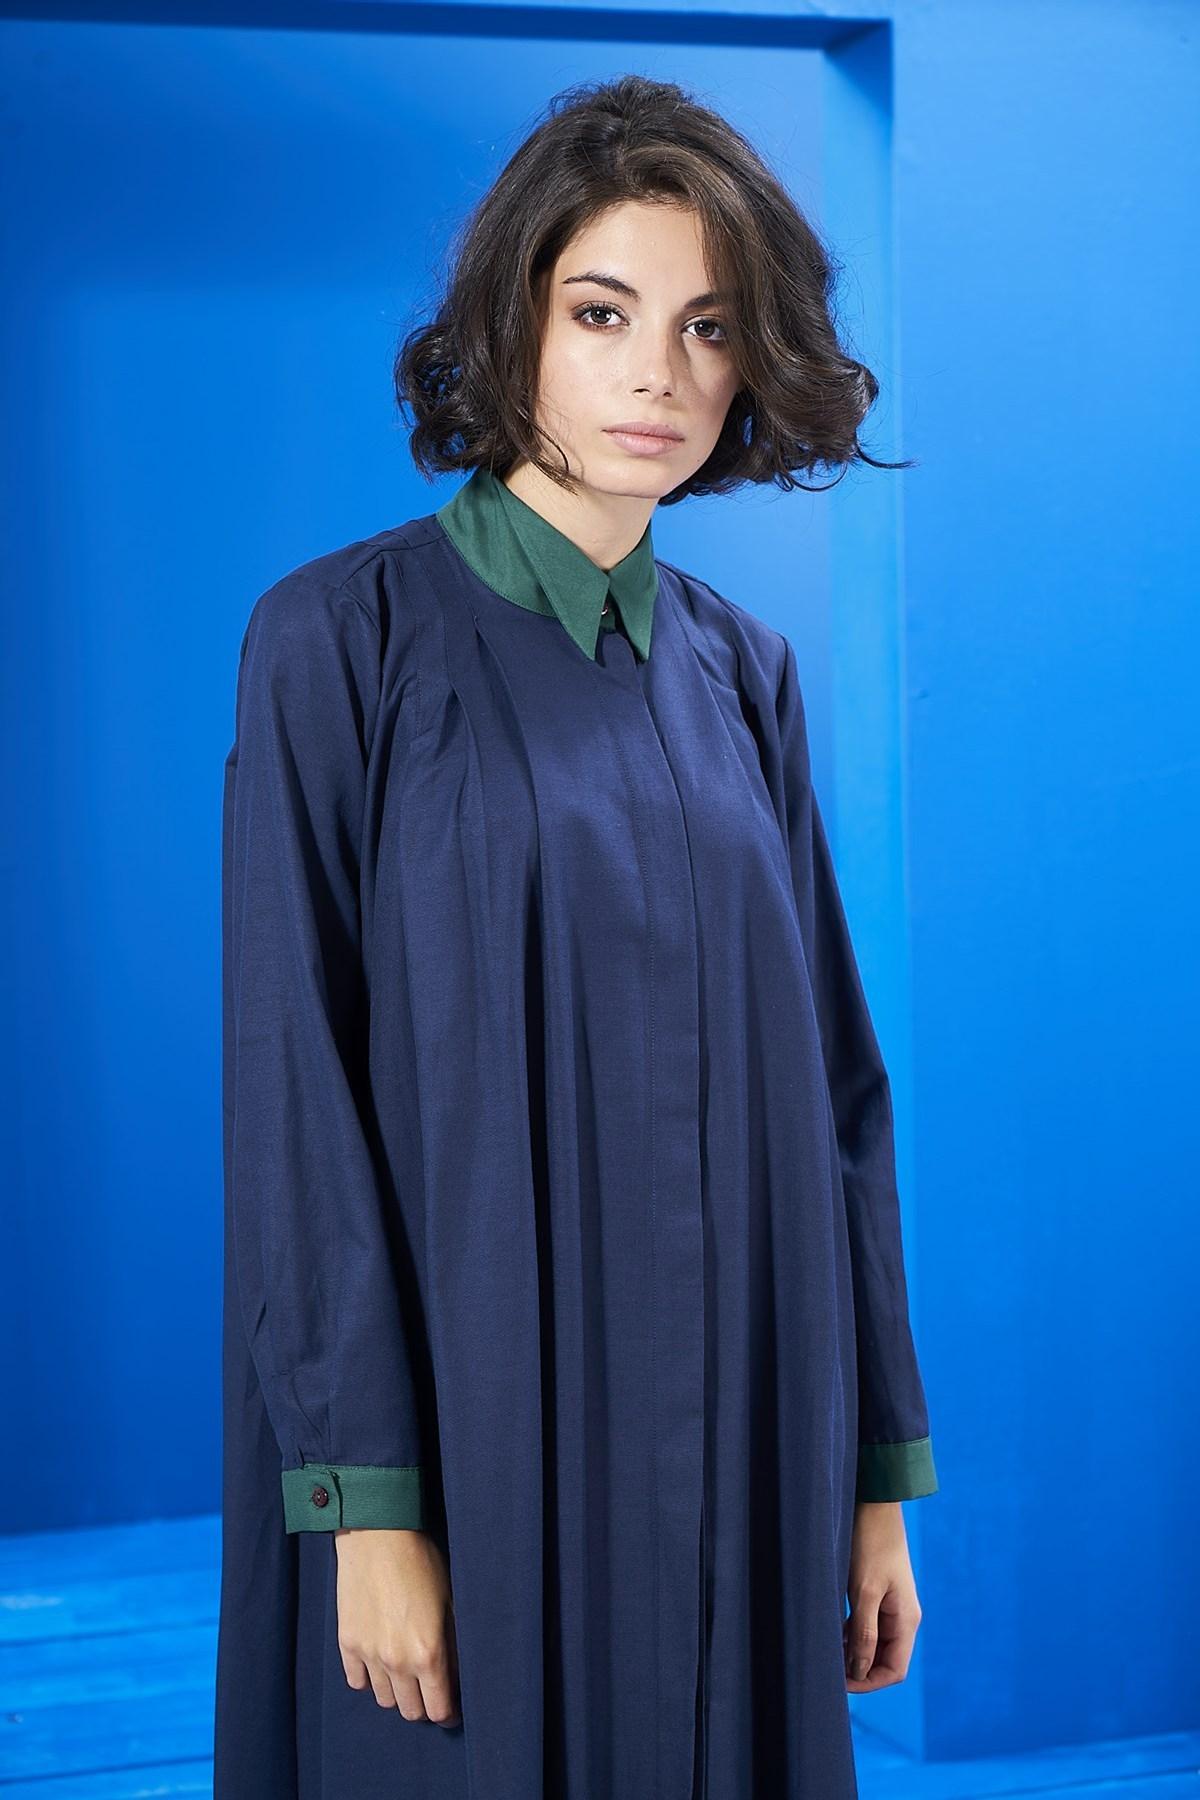 Mevra - Yaka Detay Elbise Laci-Yeşil